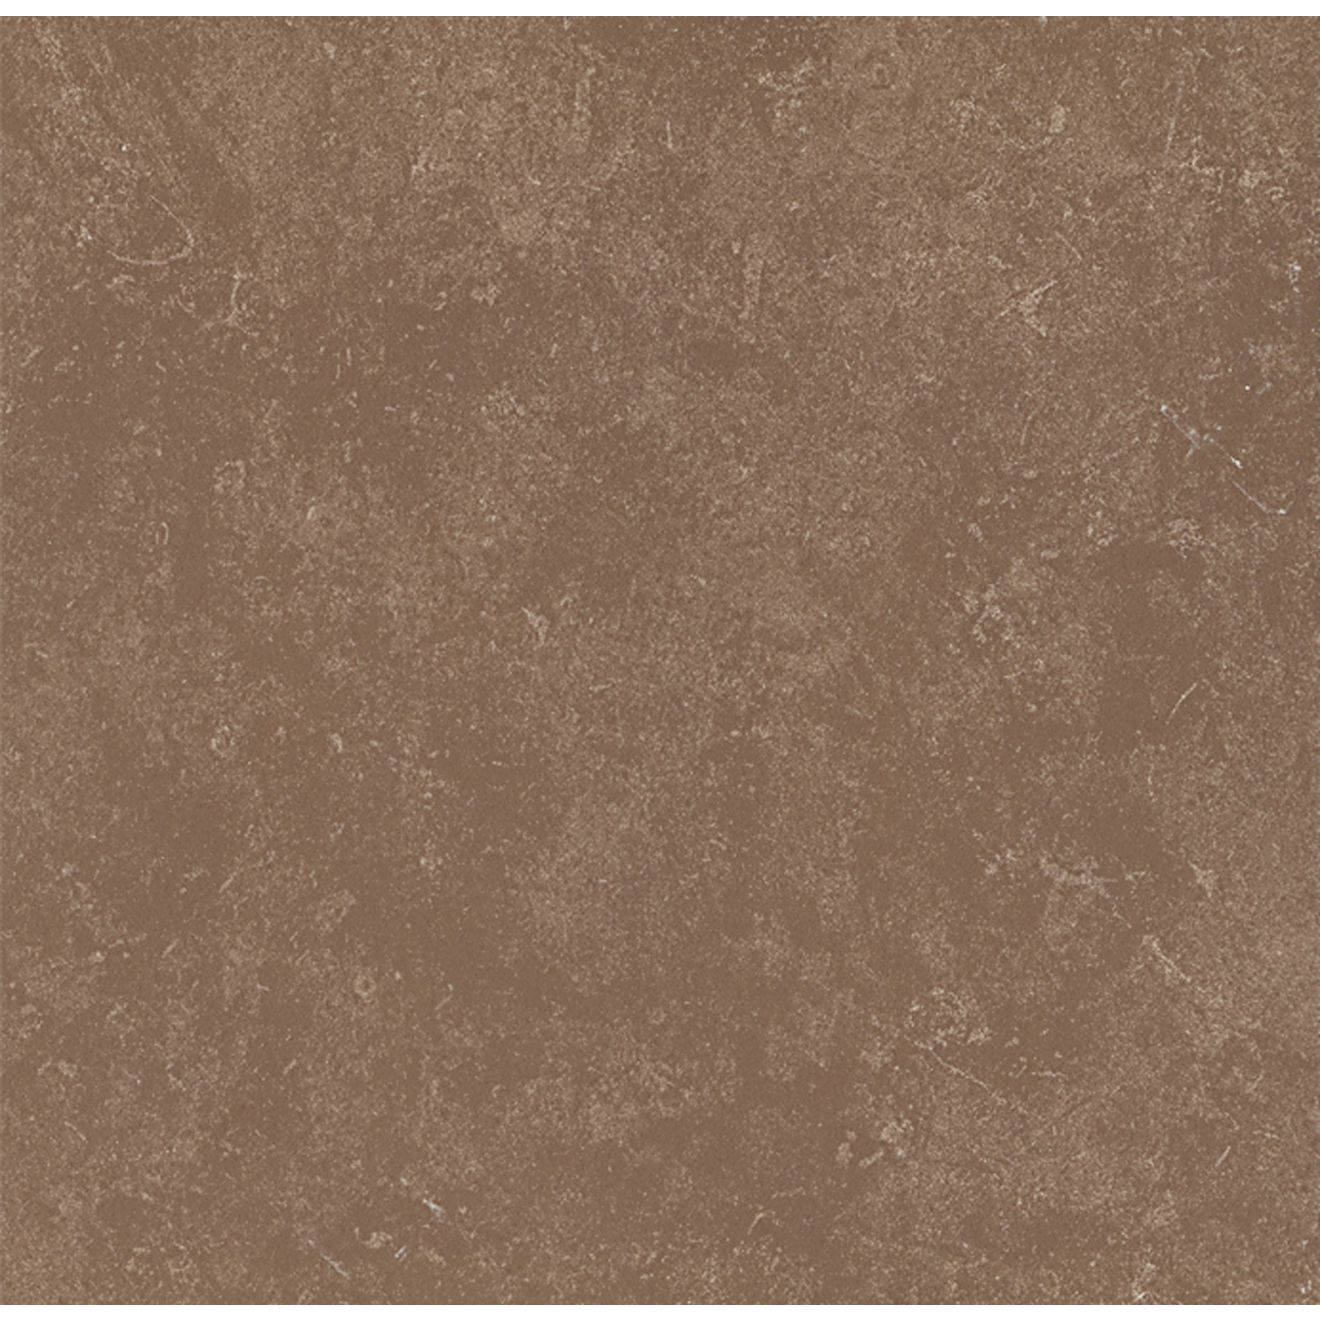 "Ararat 12""x12"" Porcelain Floor & Wall Tile in Mocha"